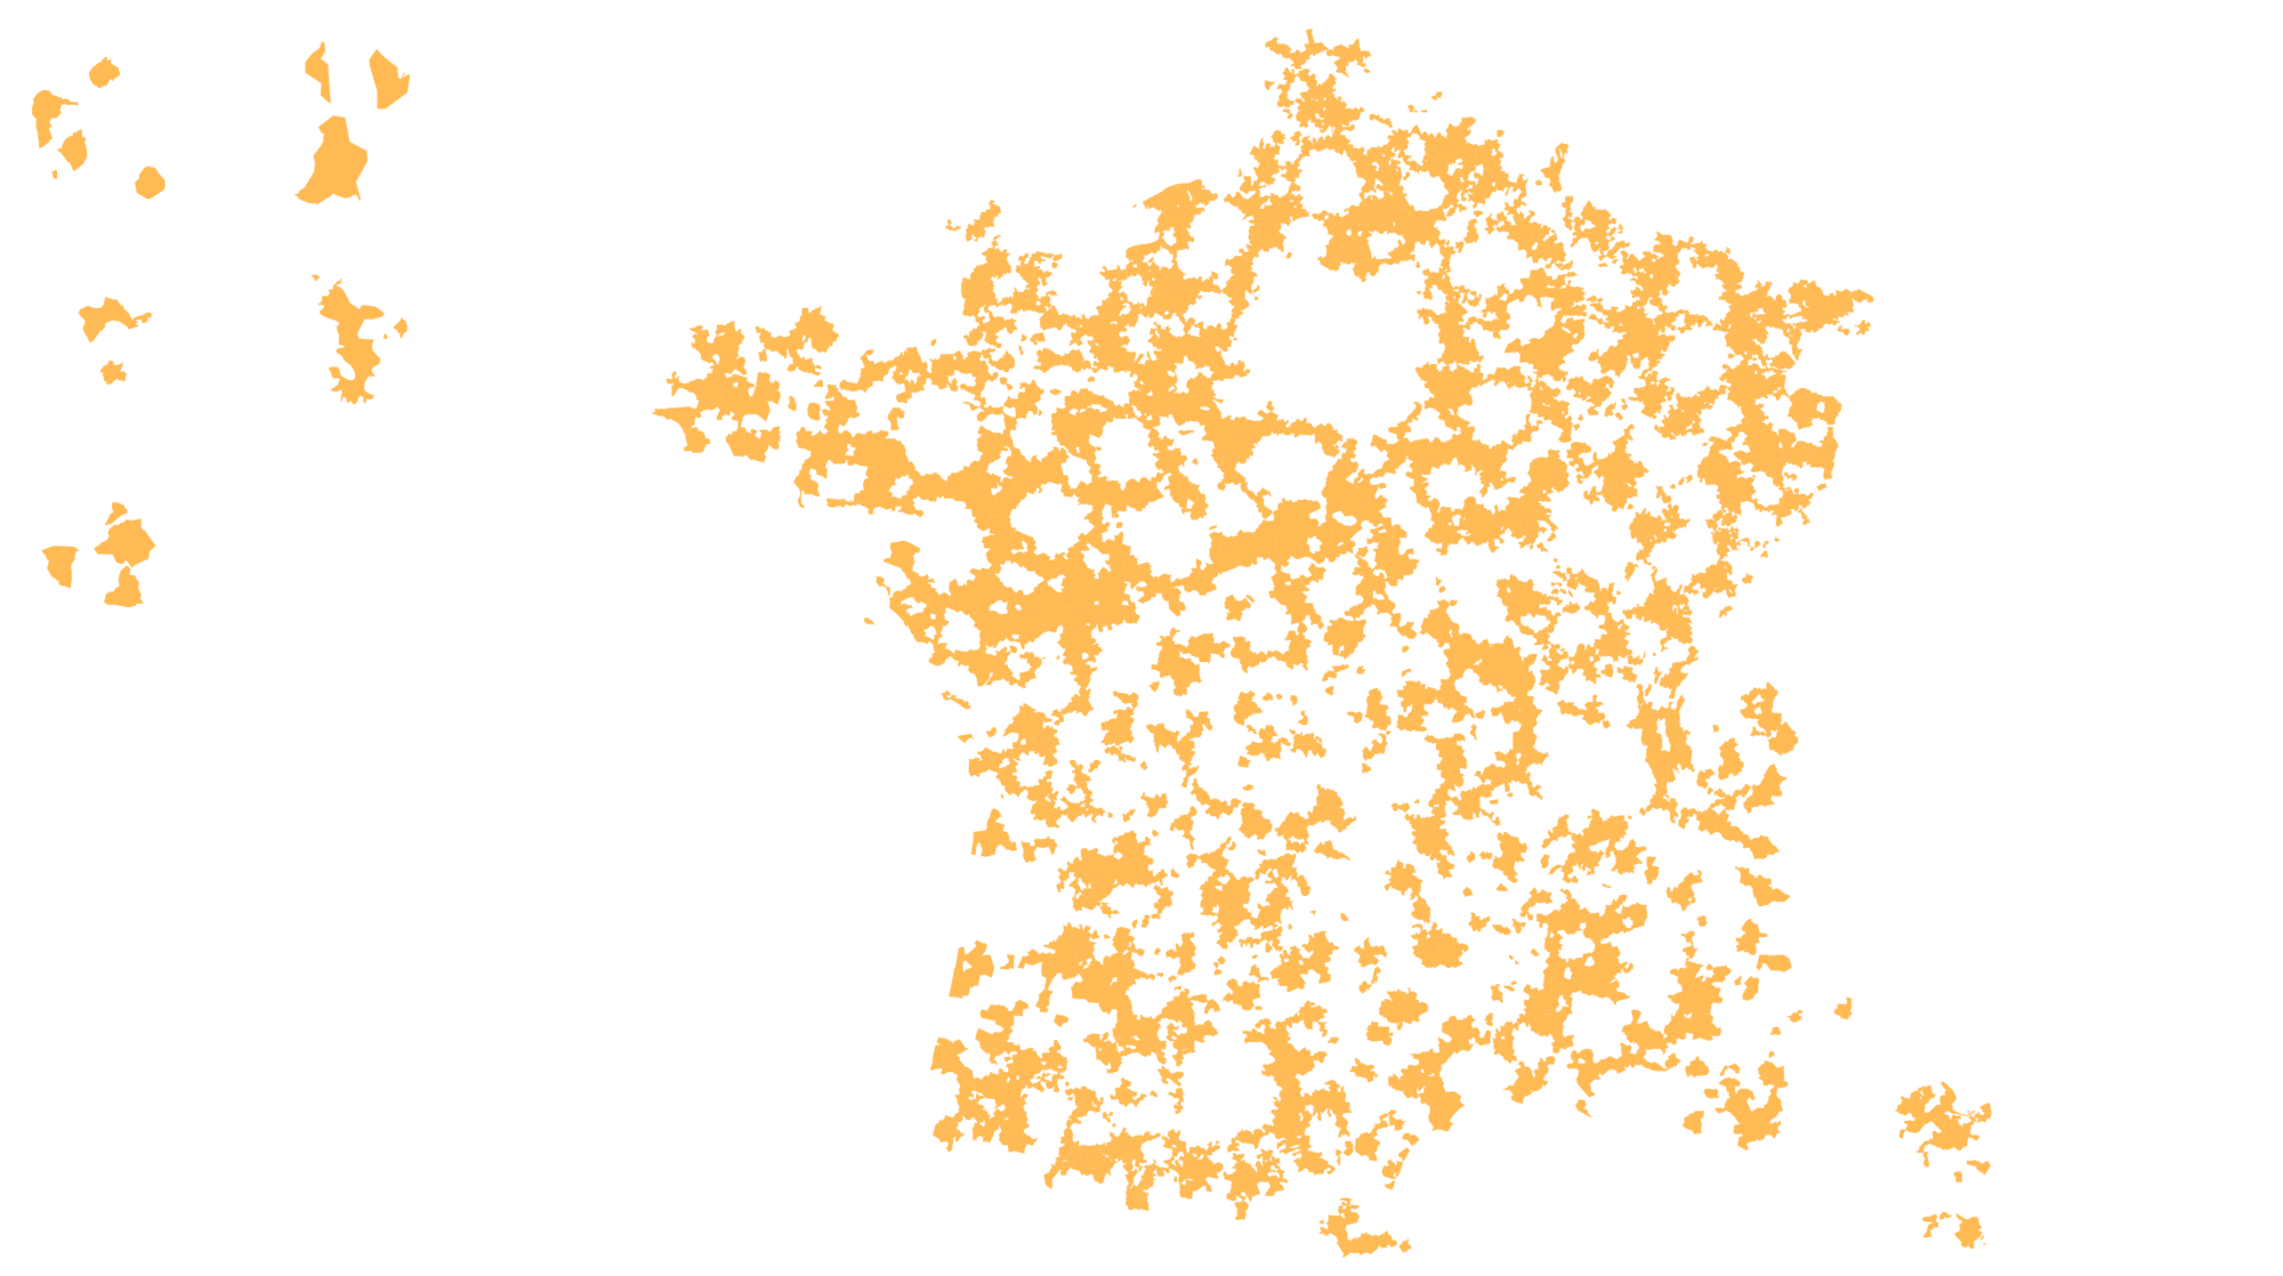 Moyennes et petites aires urbaines